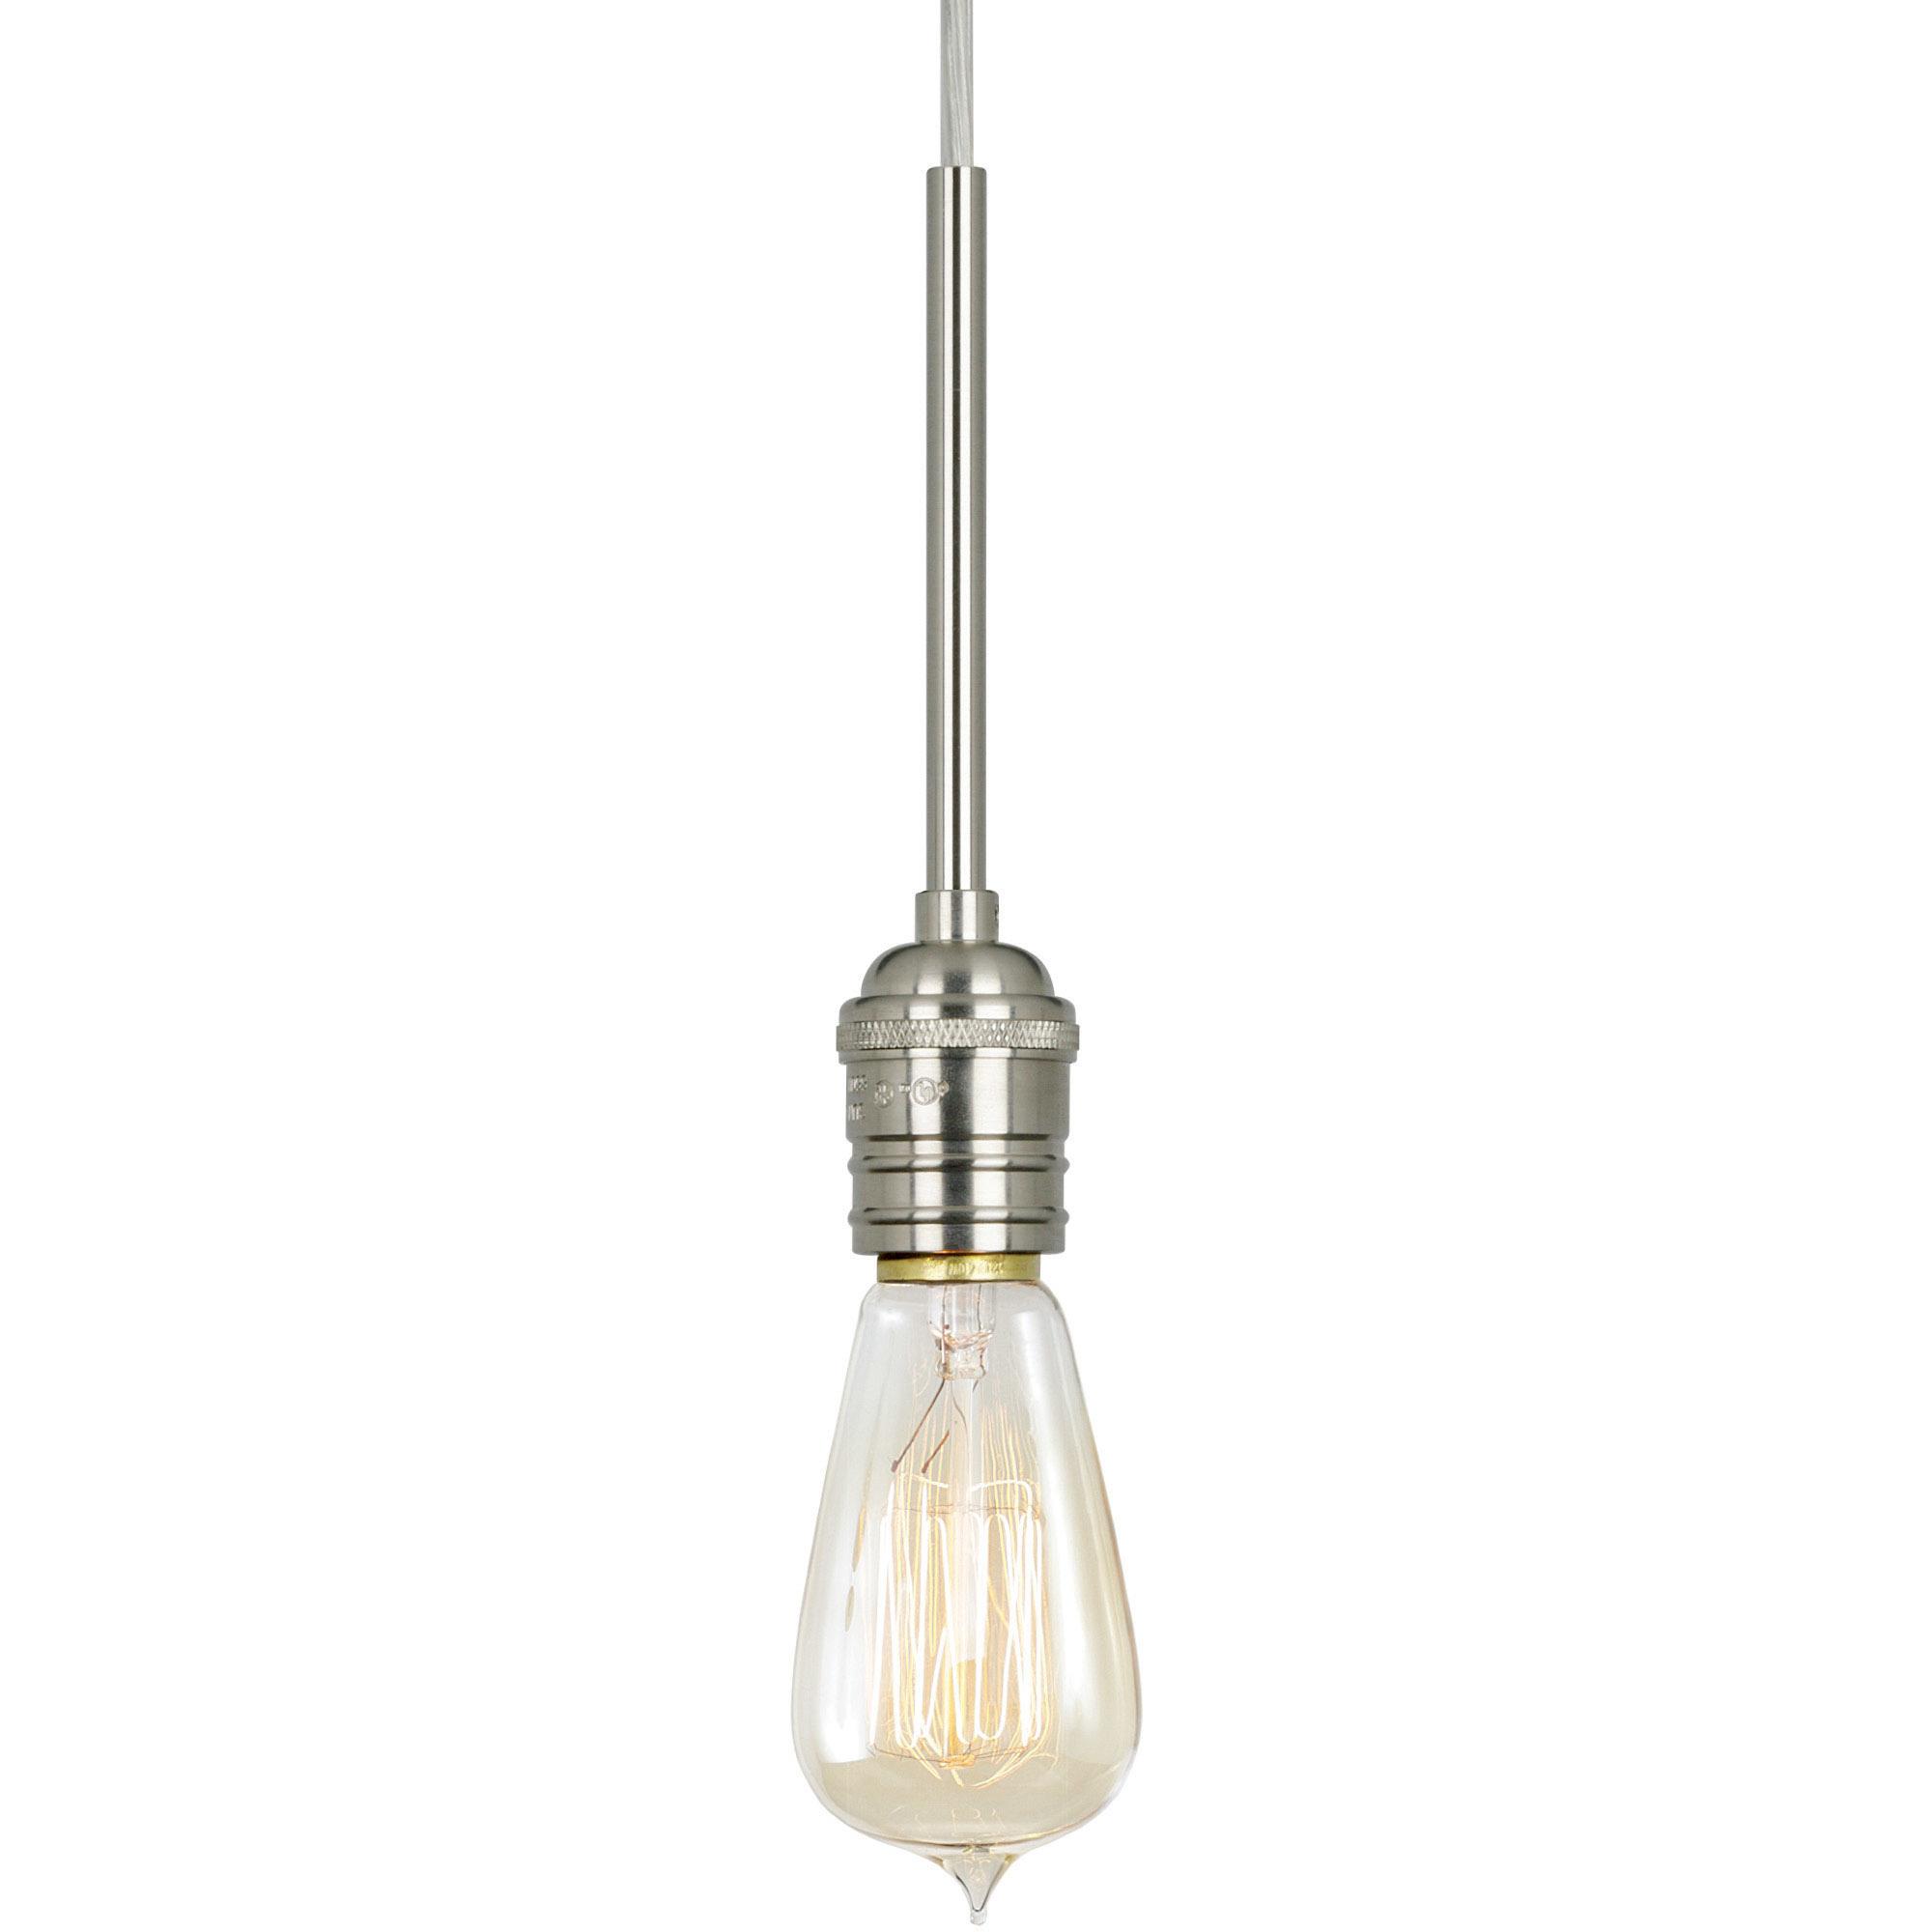 Retro Edison Pendant By Stone Lighting Pd157bpnrt6bm